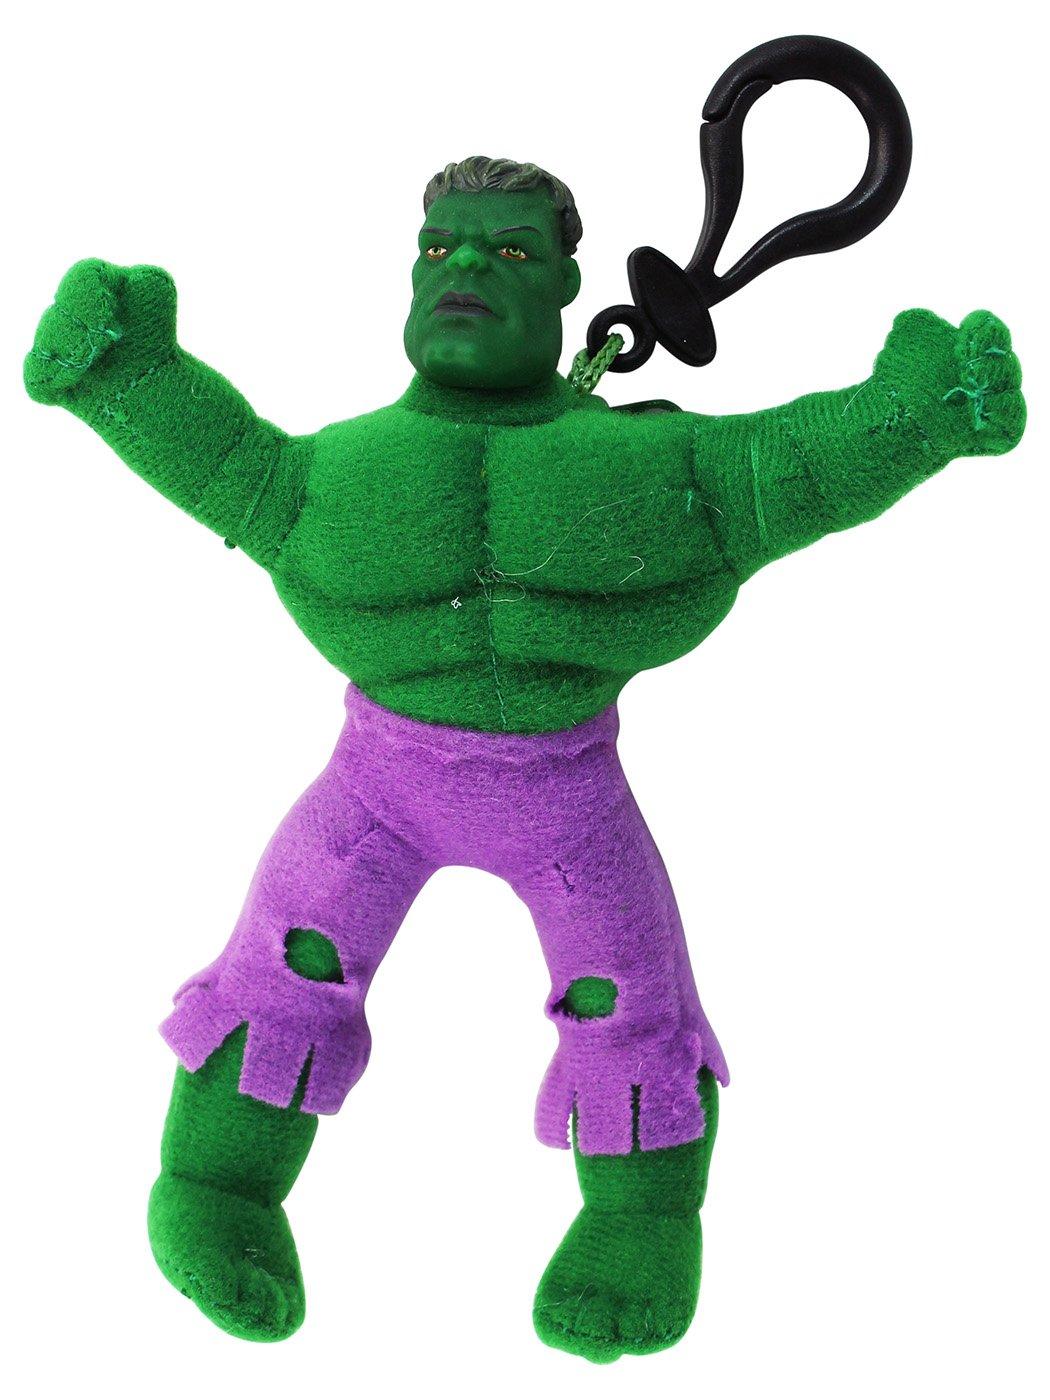 Marvel The Hulk Peluche Llavero Coin Pouch - The Hulk ...